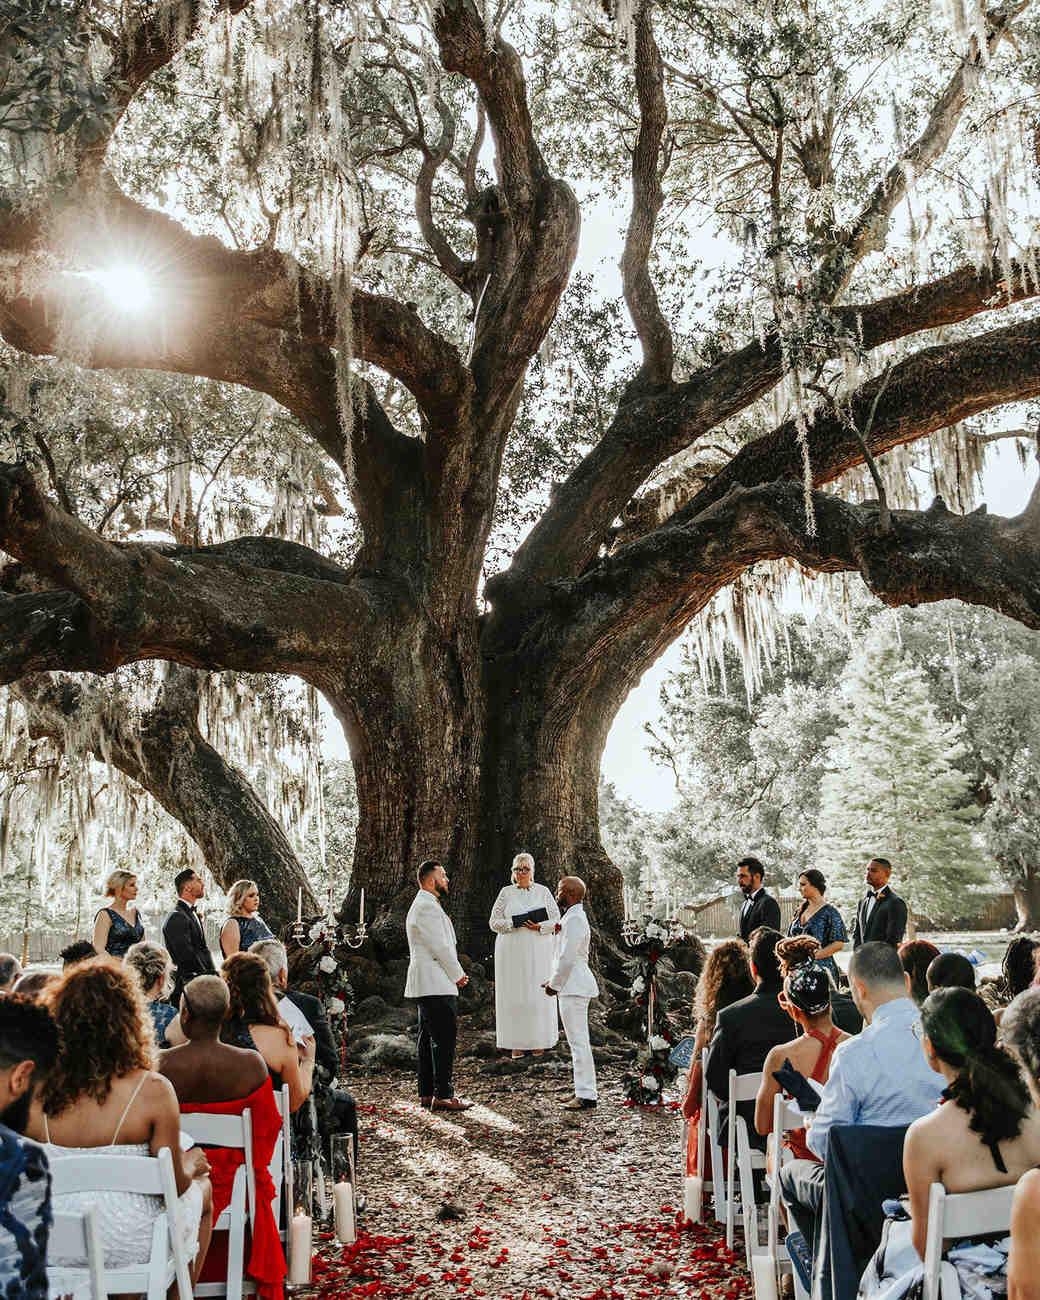 joe tim new orleans wedding ceremony by tree